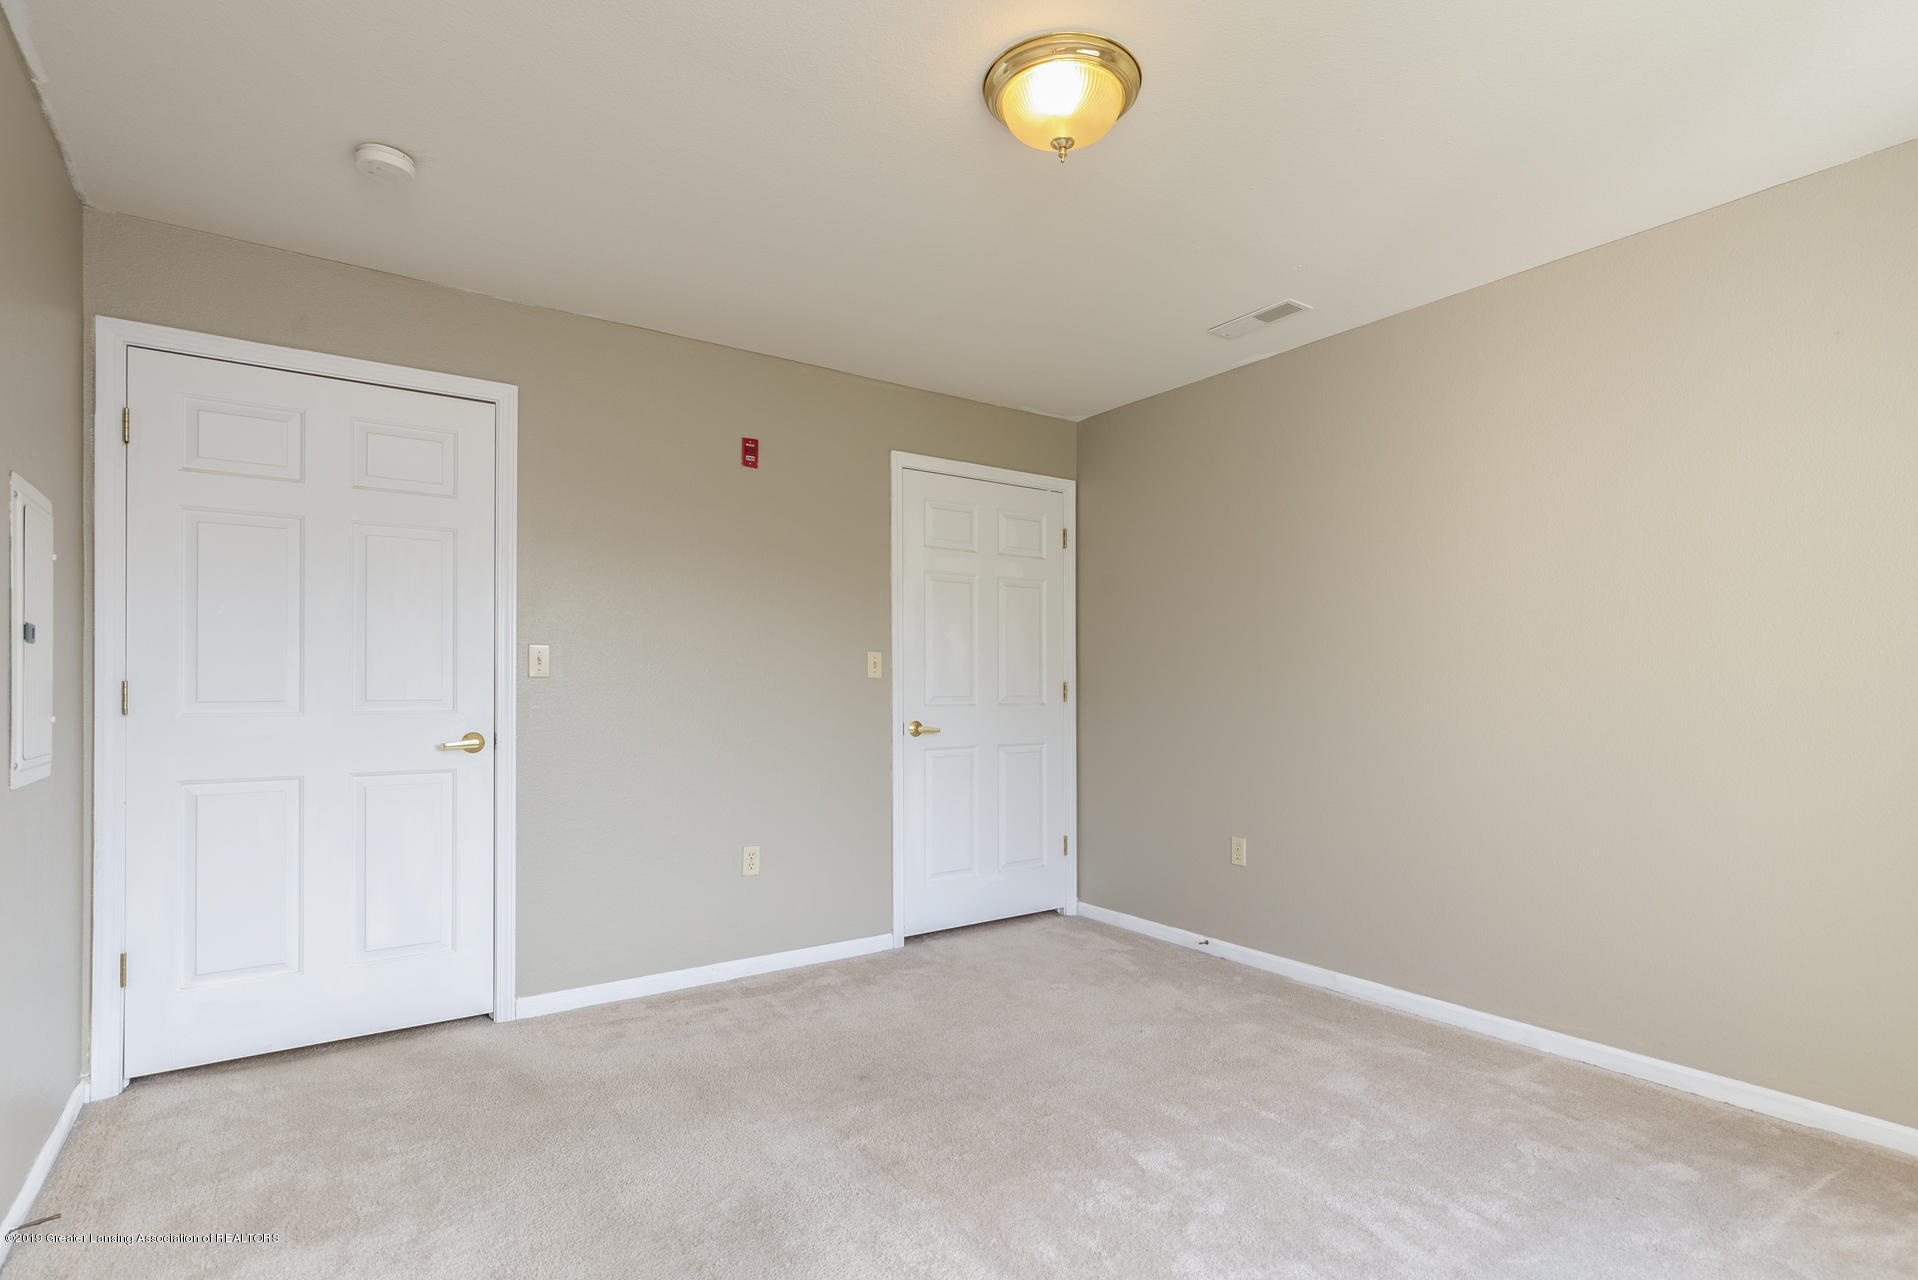 338 W Saginaw St UNIT 44 - 013-photo-bedroom-7483693 - 14